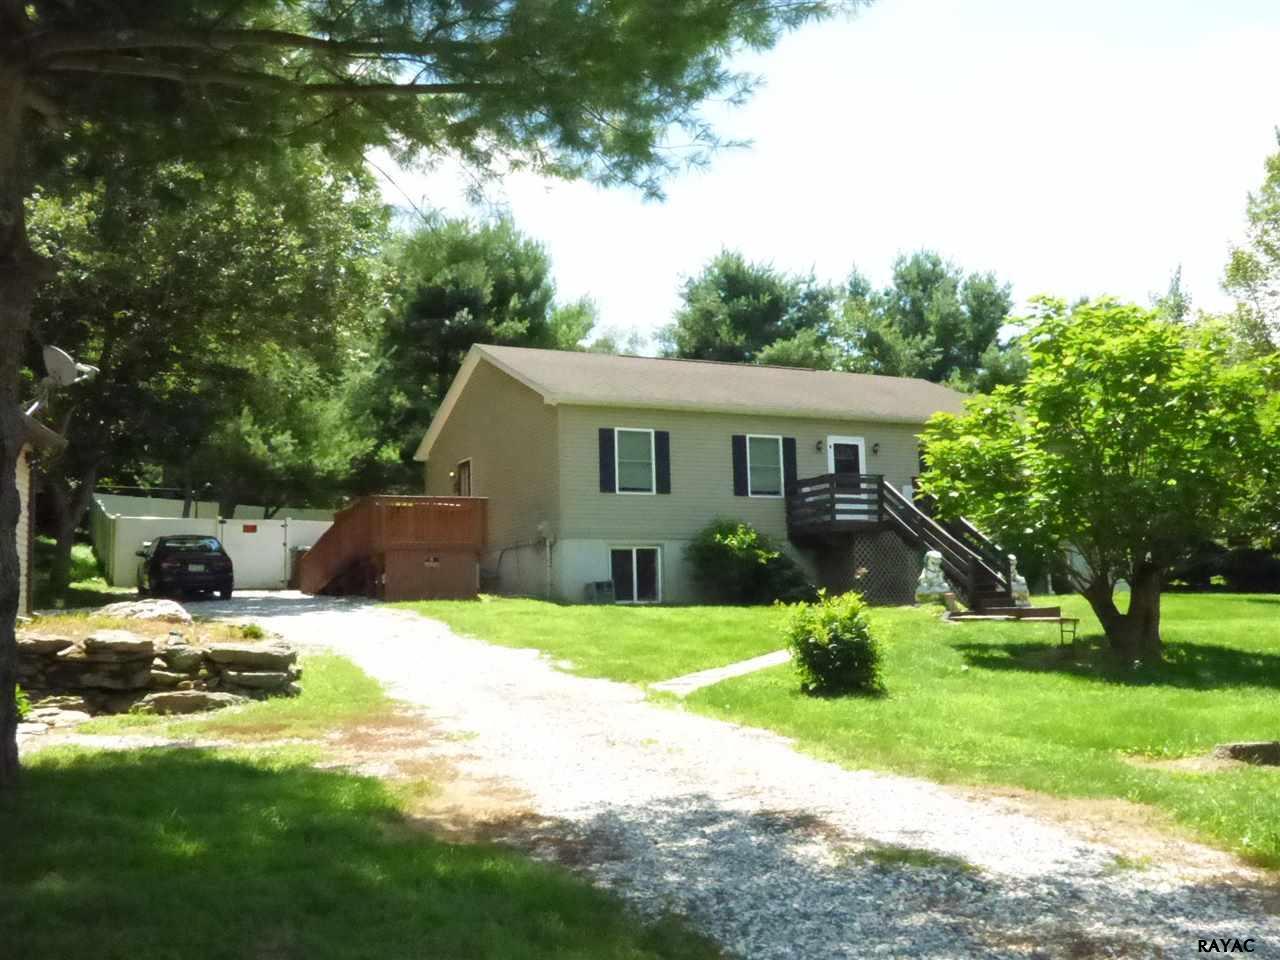 9362 Hollow Rd, Felton, PA 17322